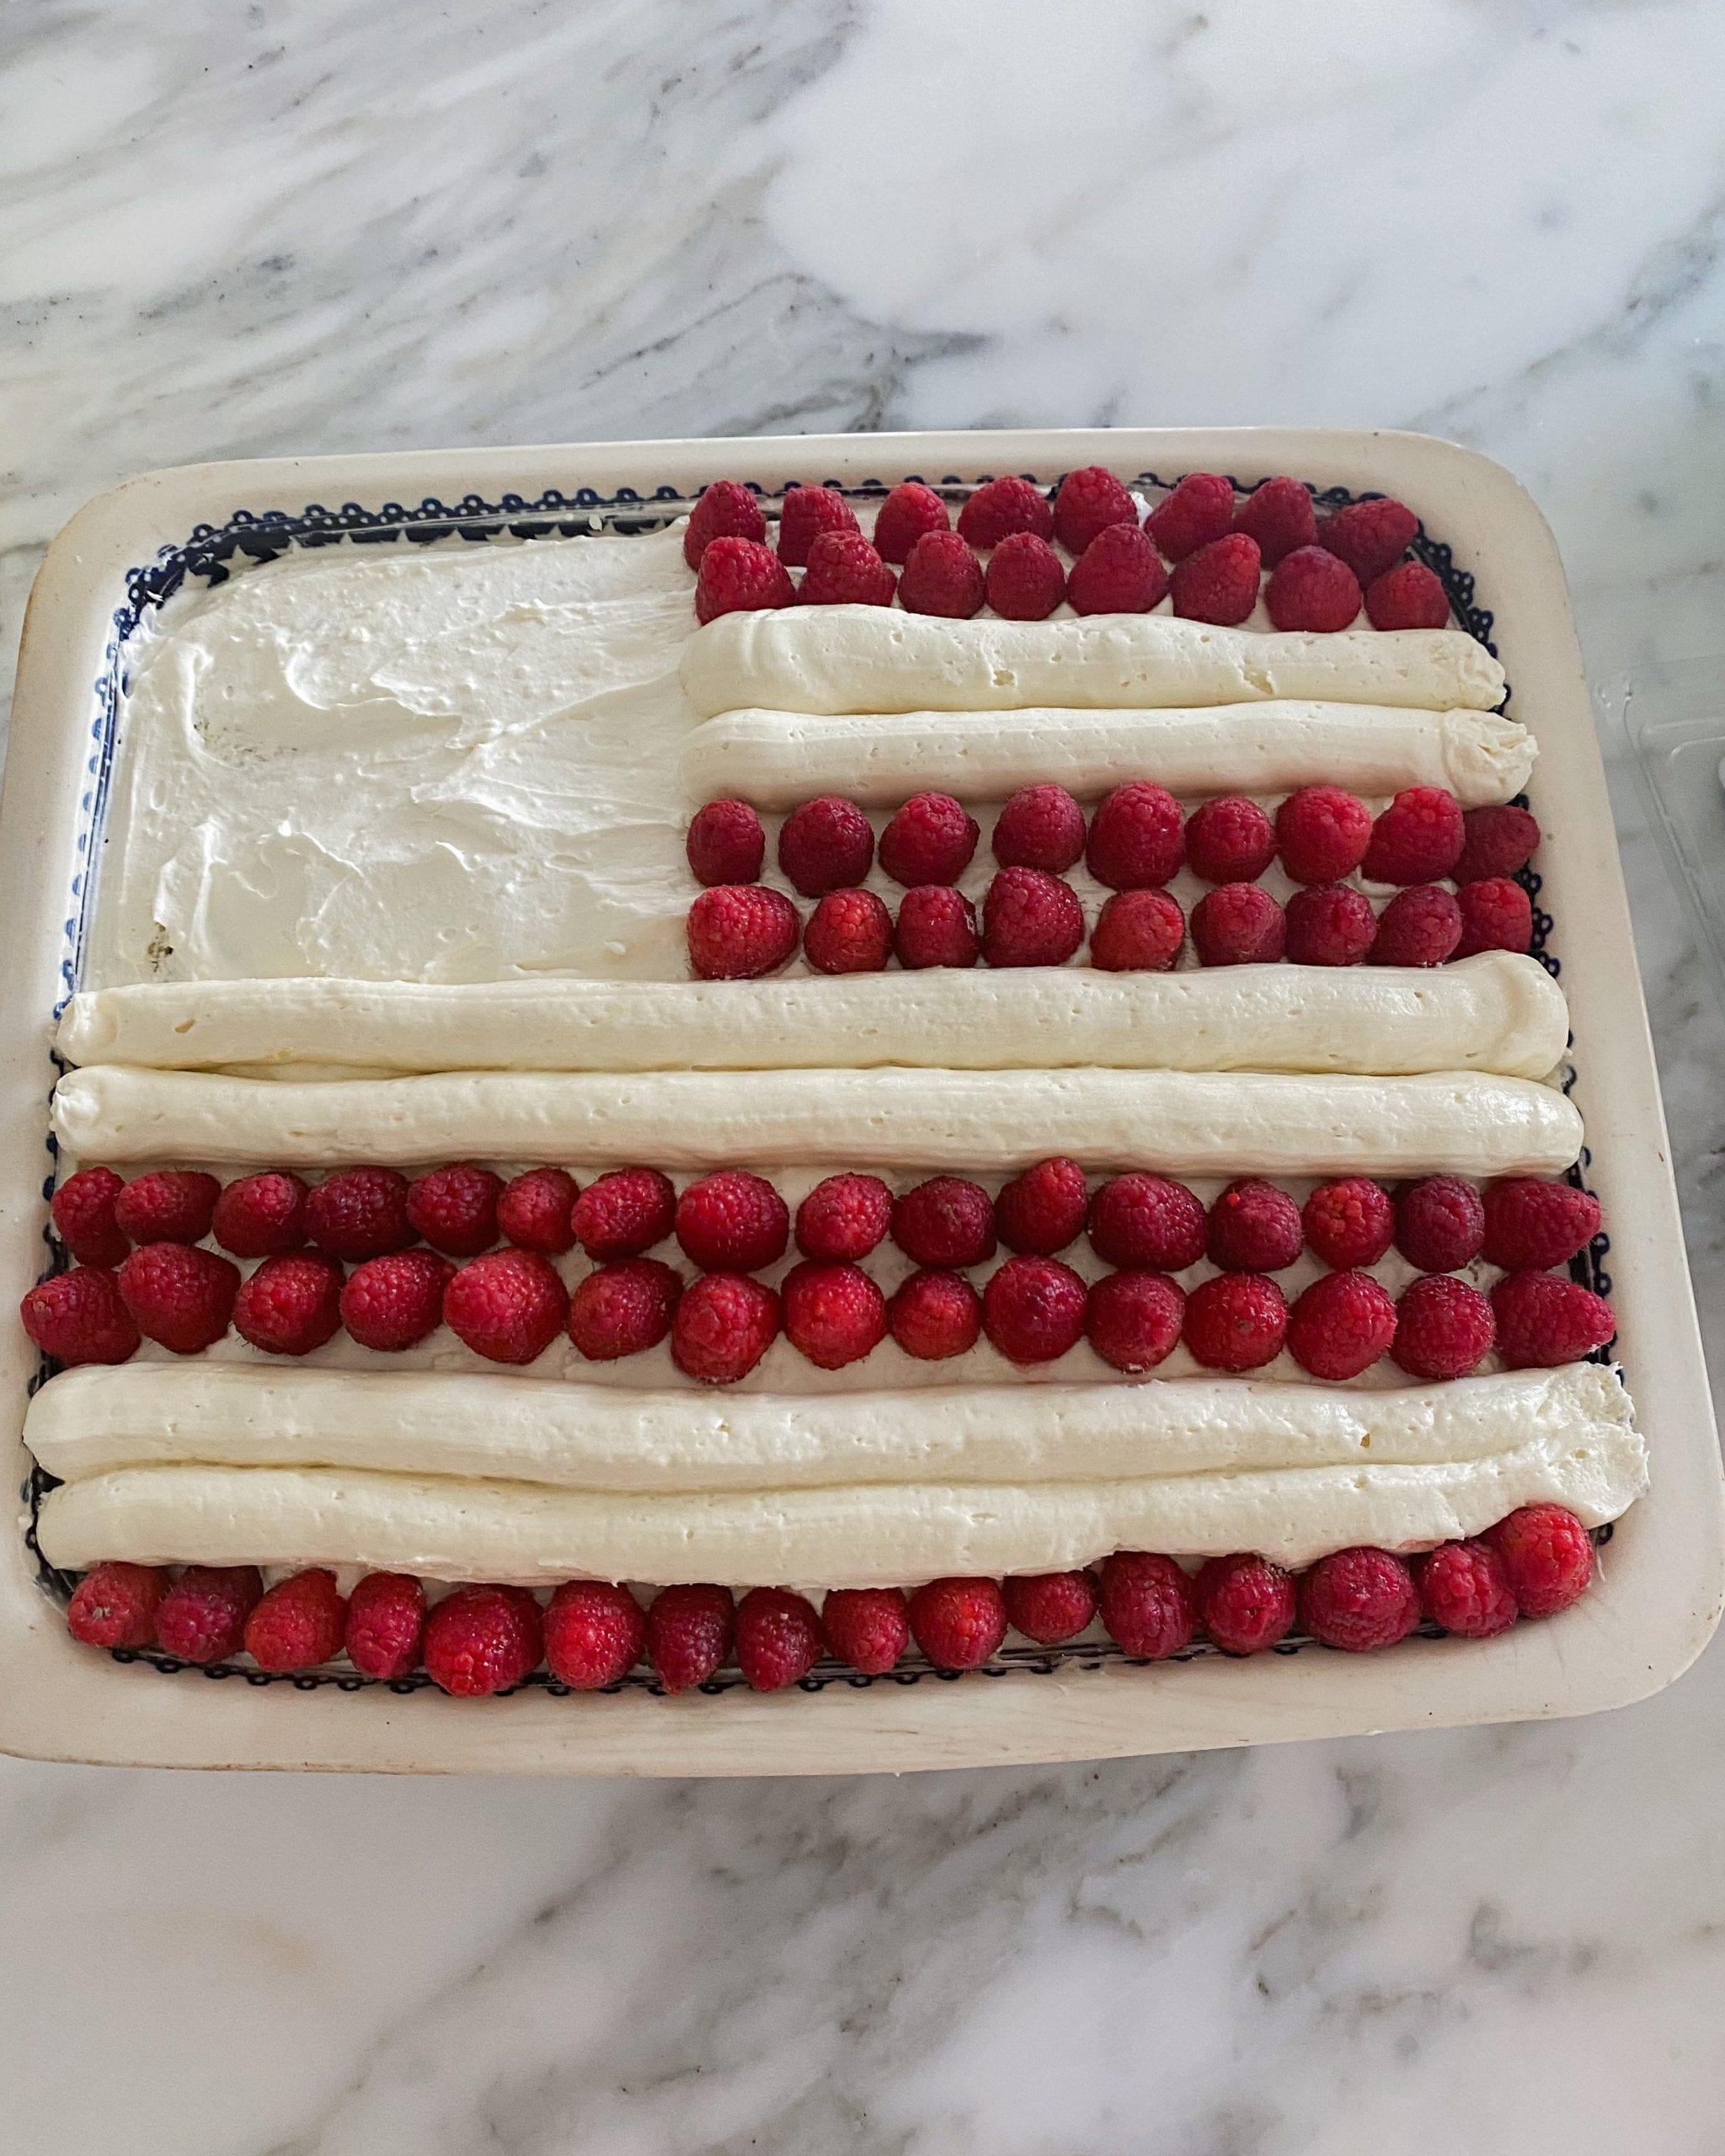 Stars and Stripes cake decorating